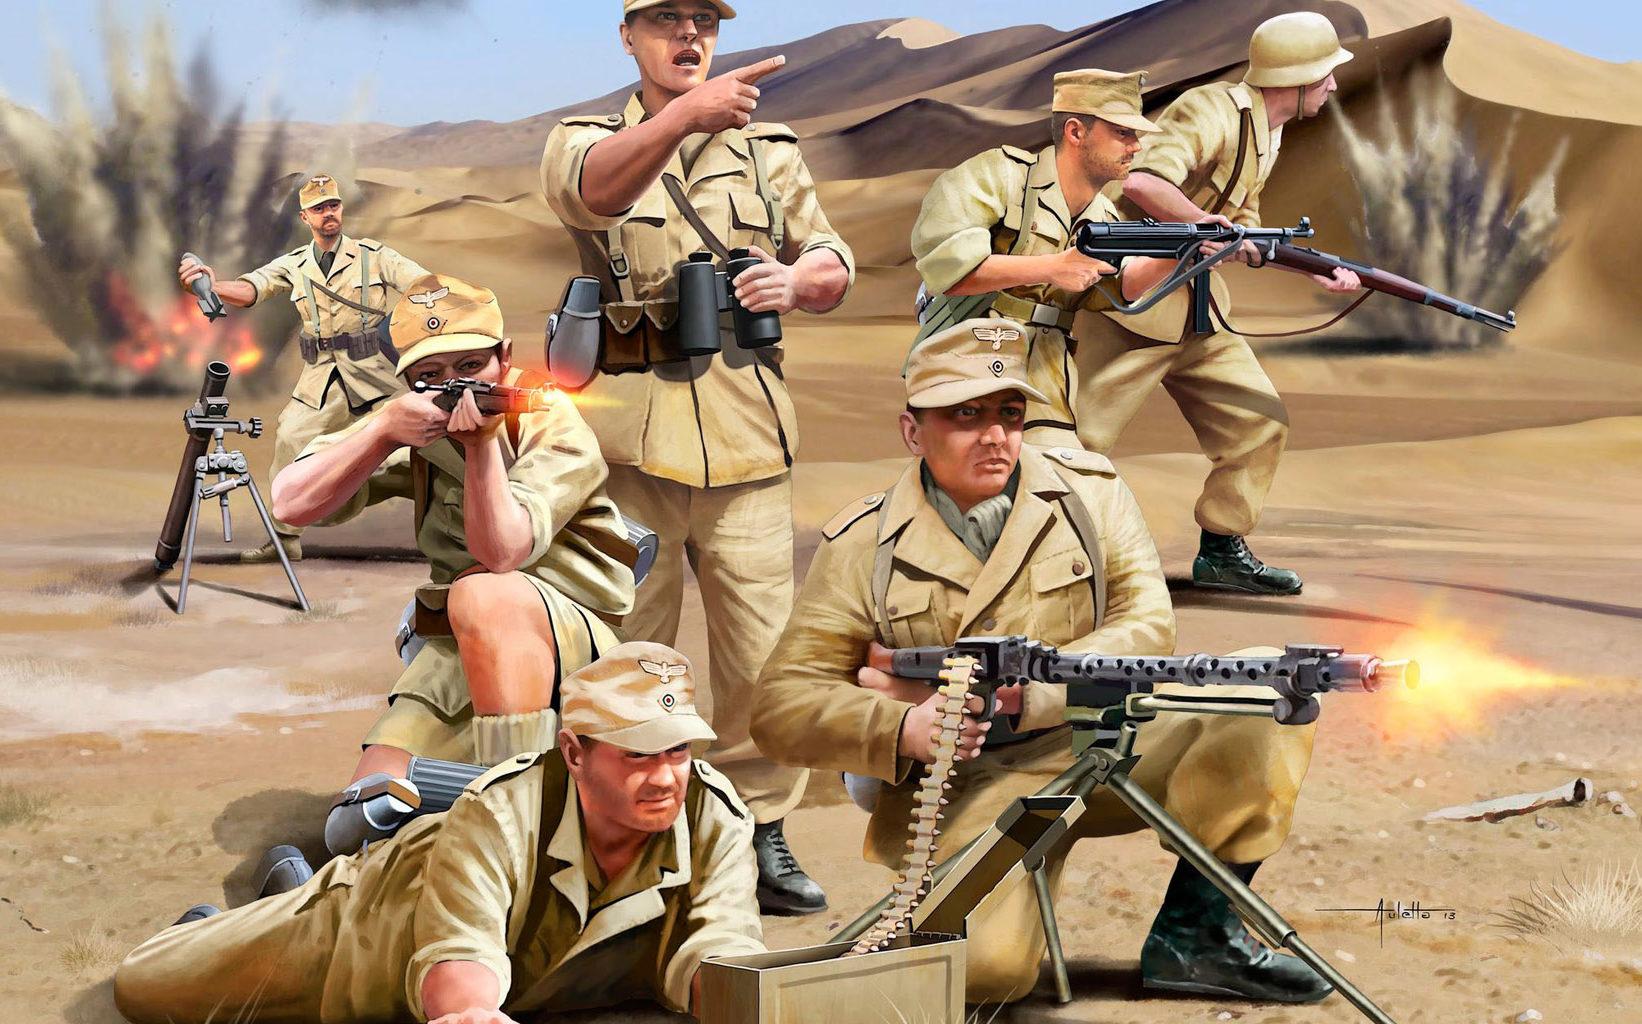 Auletta Vincenzo. Немецкая пехота африканского корпуса.